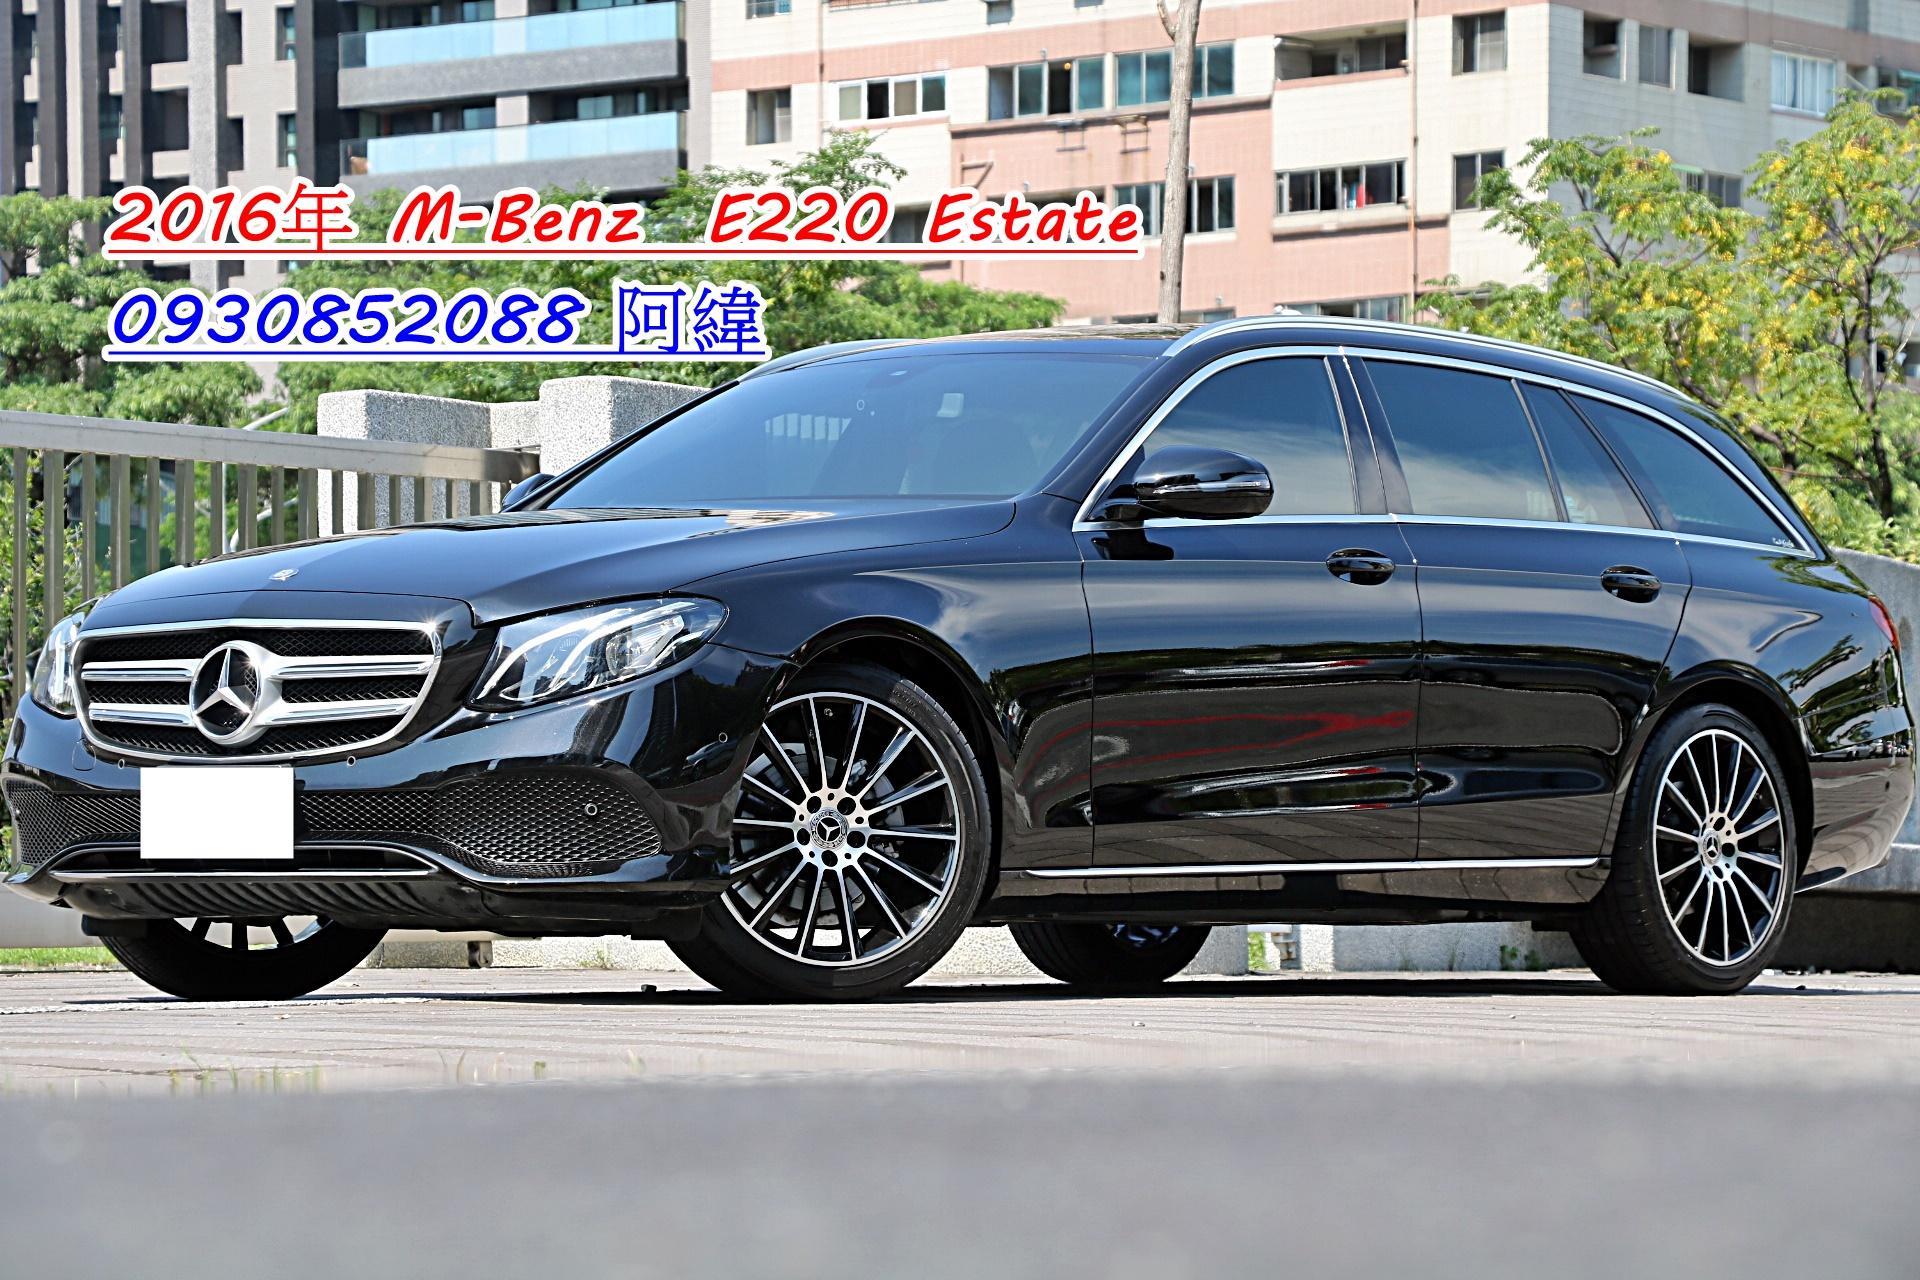 2016 M-Benz 賓士 E-class estate